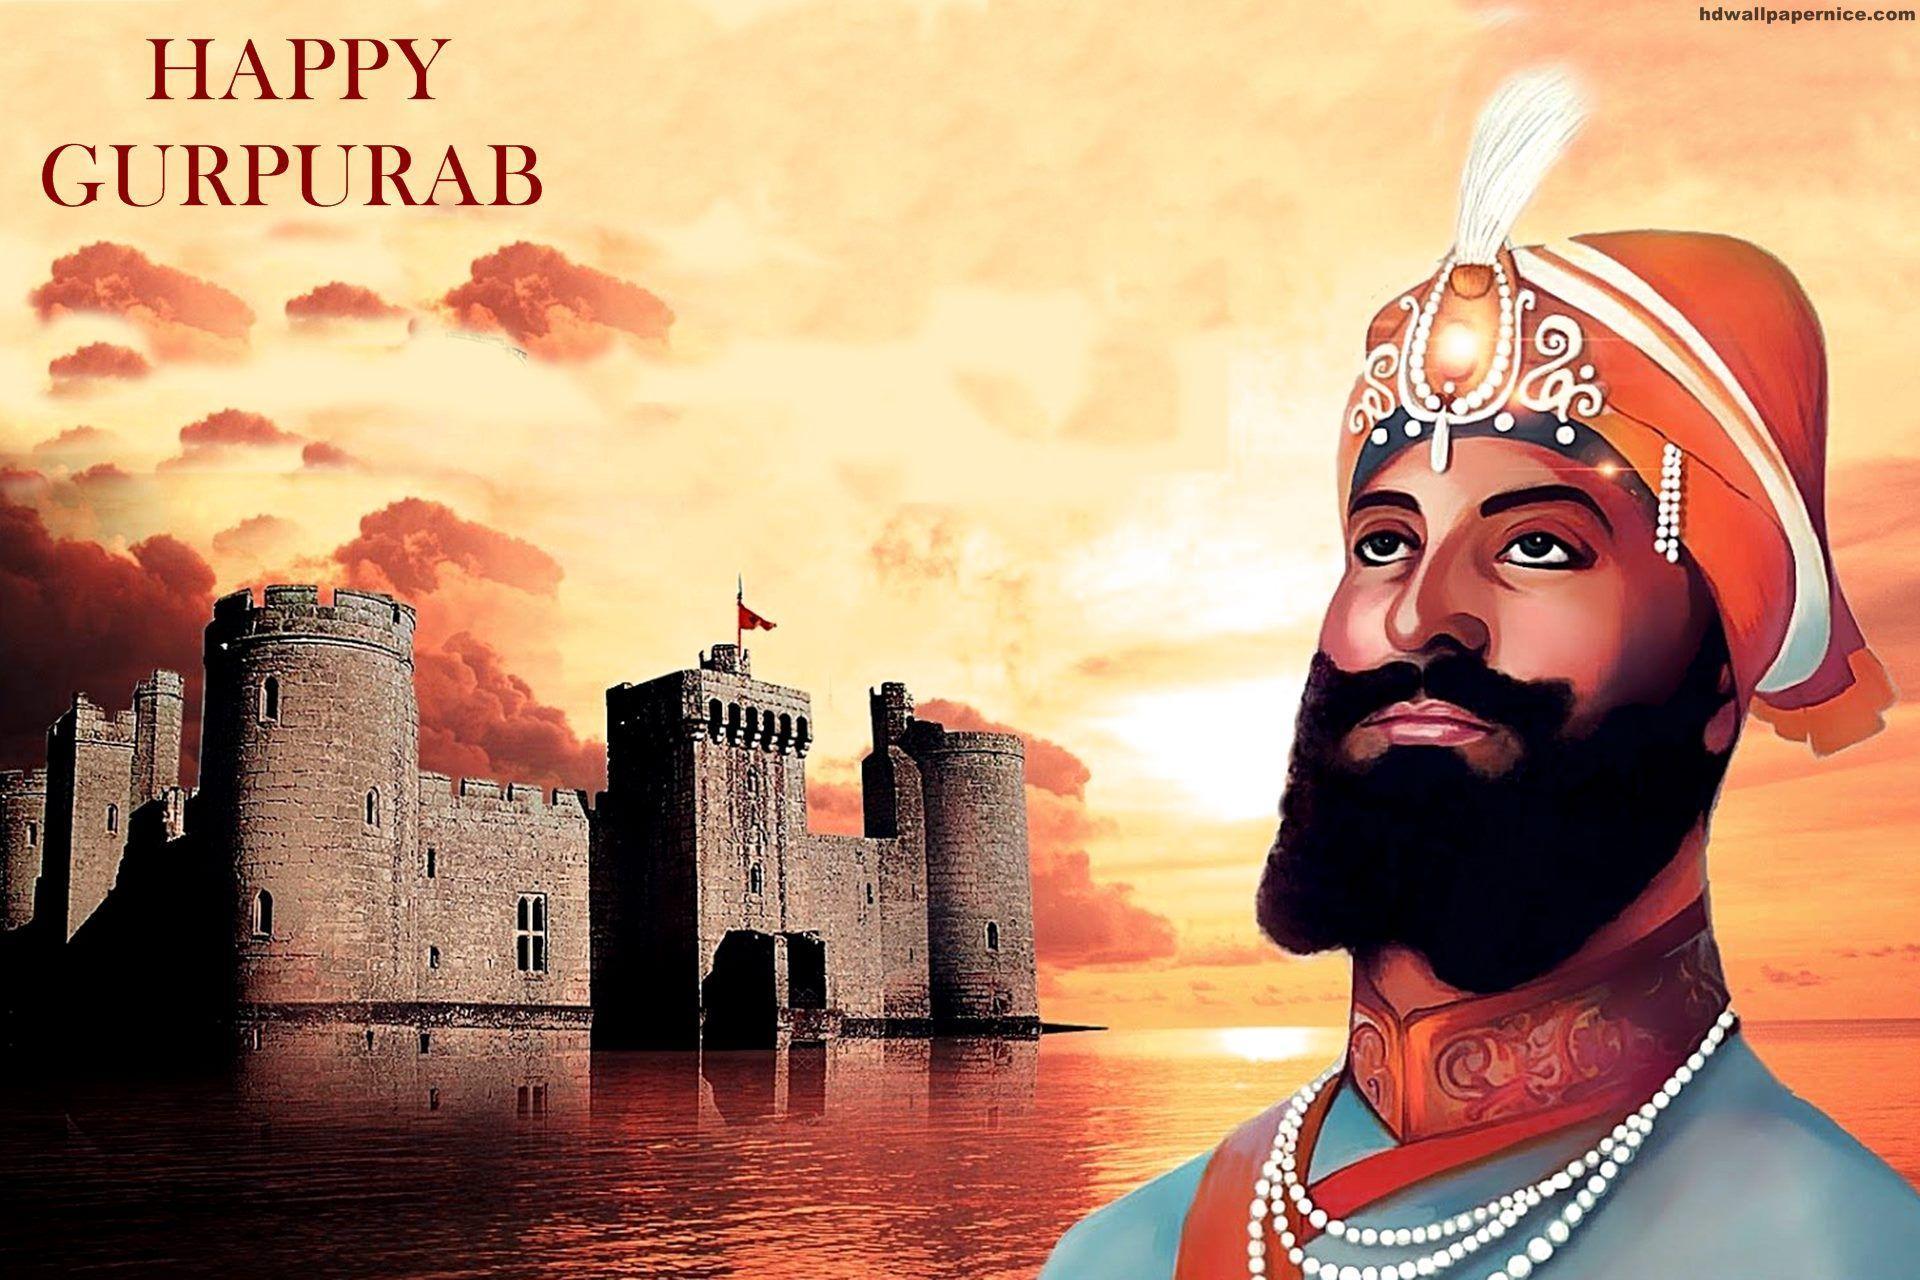 Hd wallpapers shri guru gobind singh ji for pc wallpaper - Shri guru gobind singh ji wallpaper ...